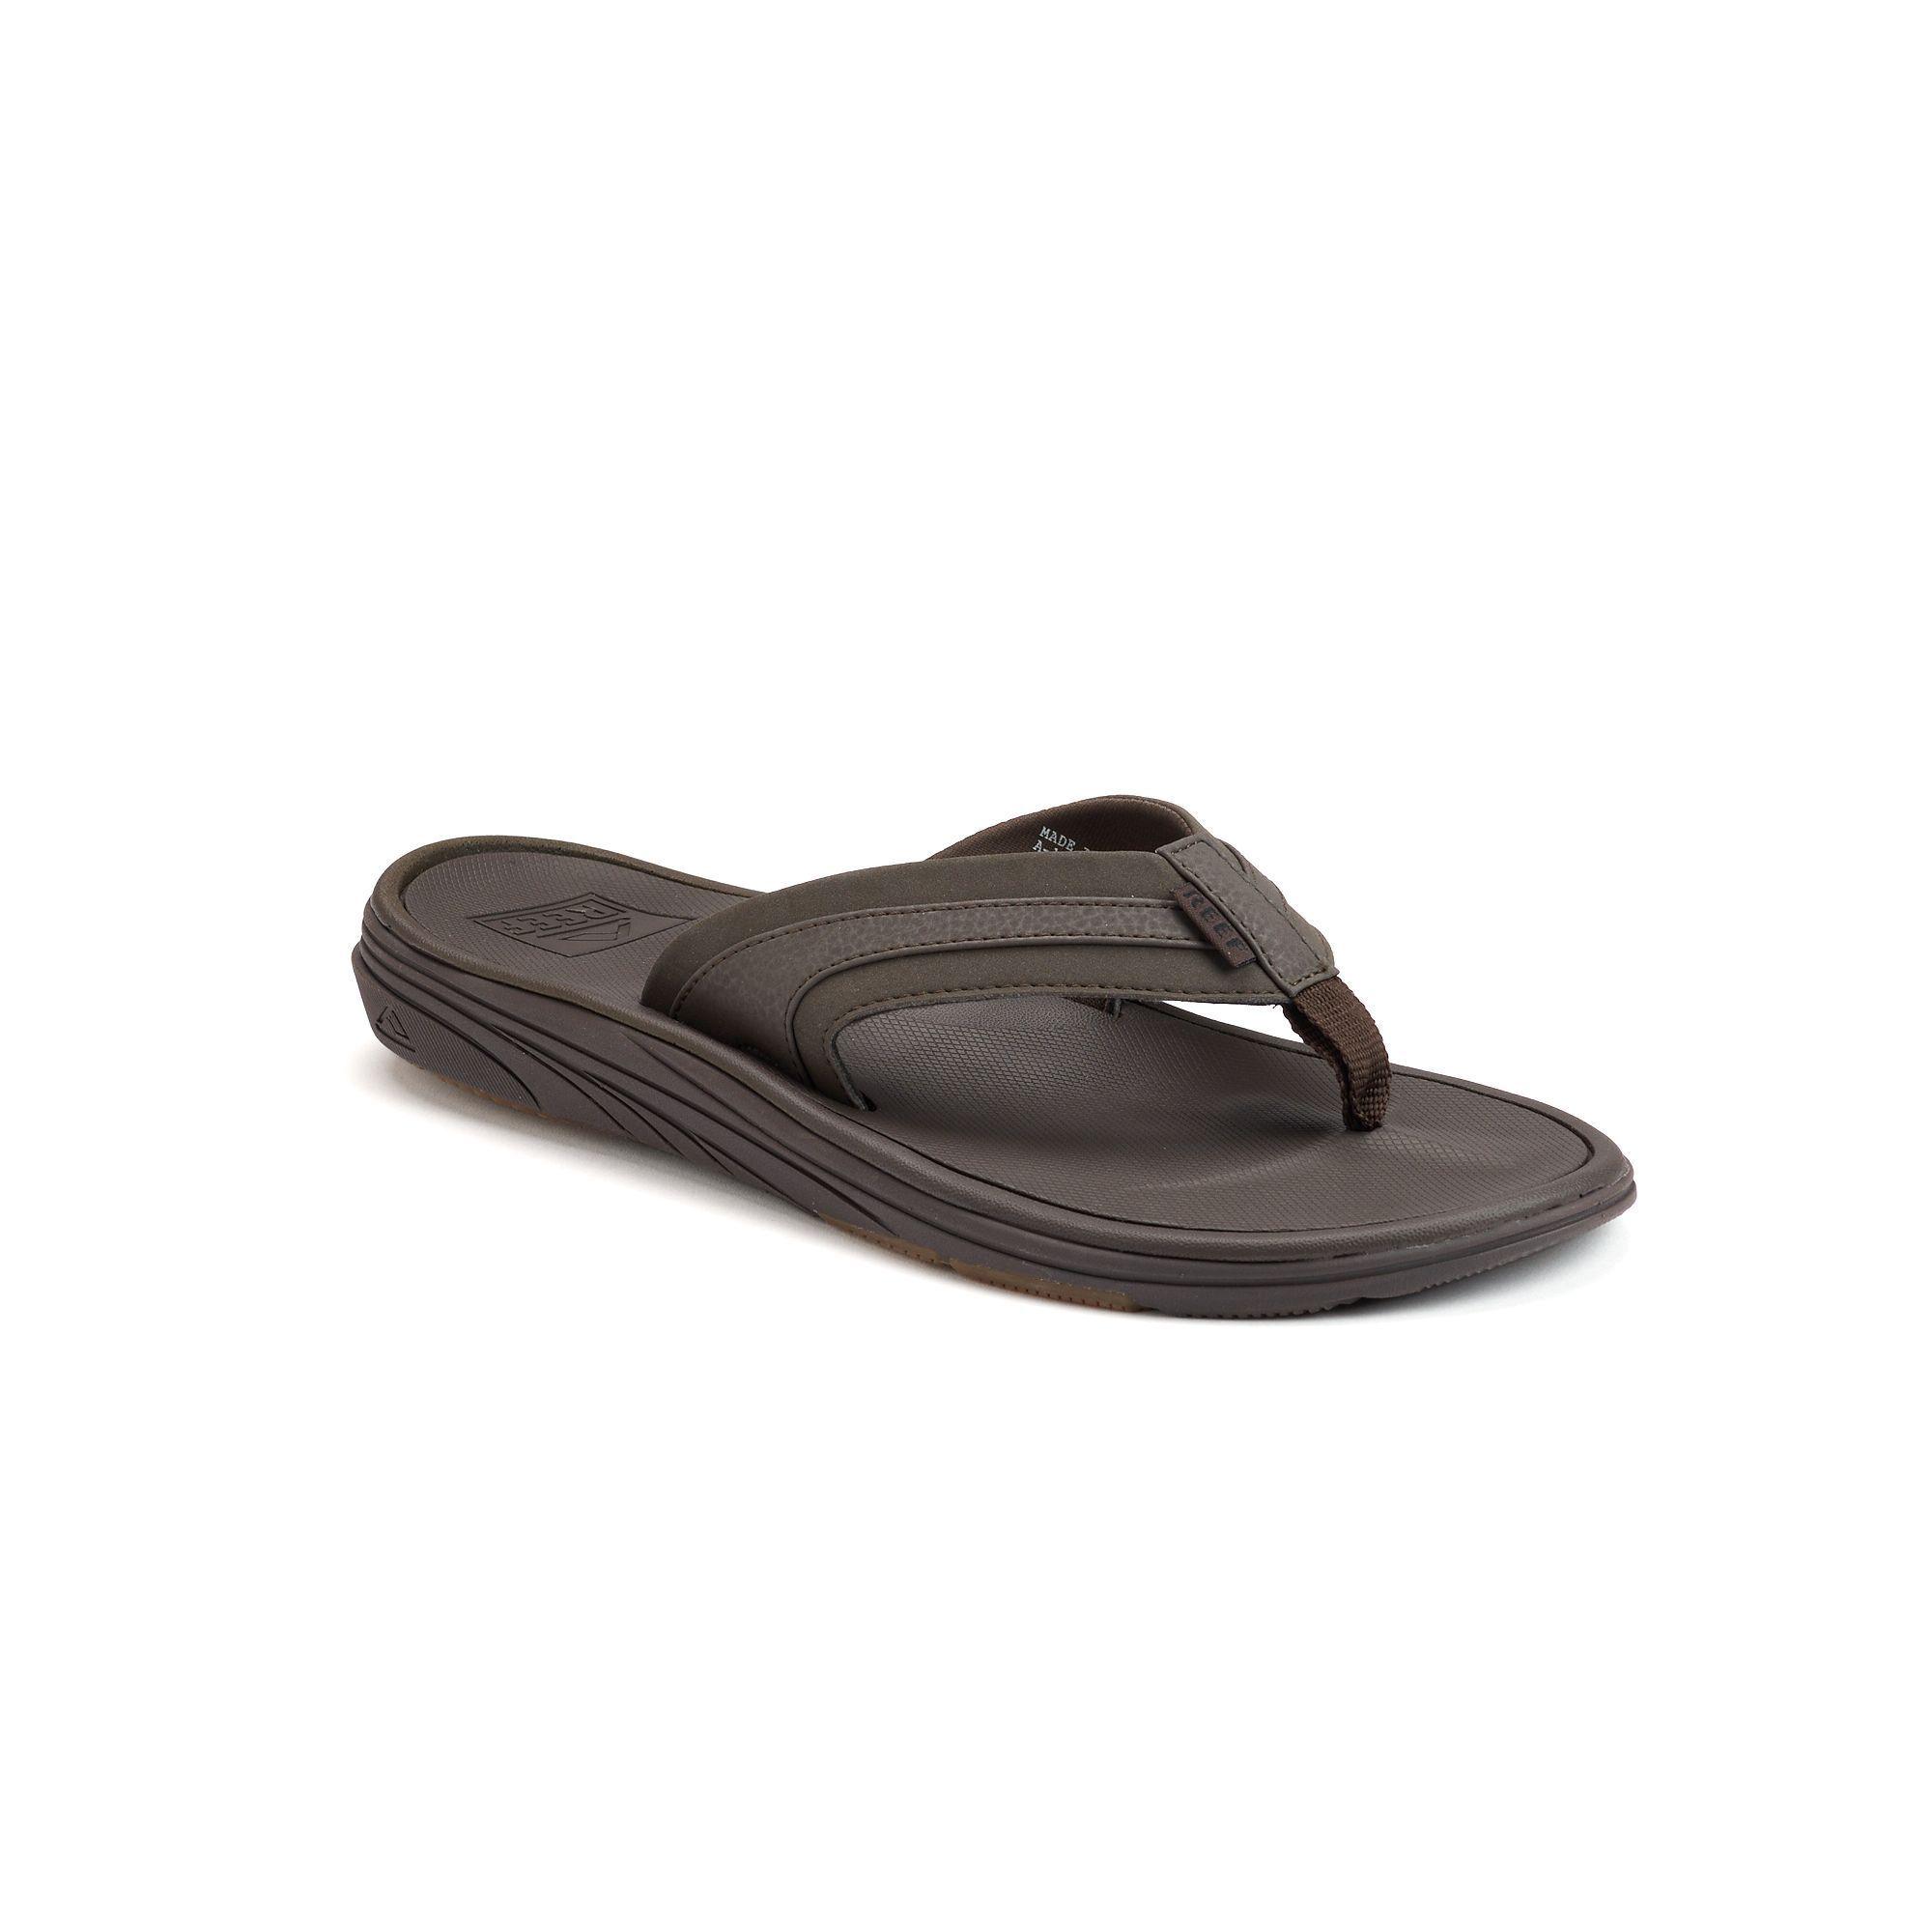 Reef Phoenix Tan Men's Sandals Flip Flops Thong Black New